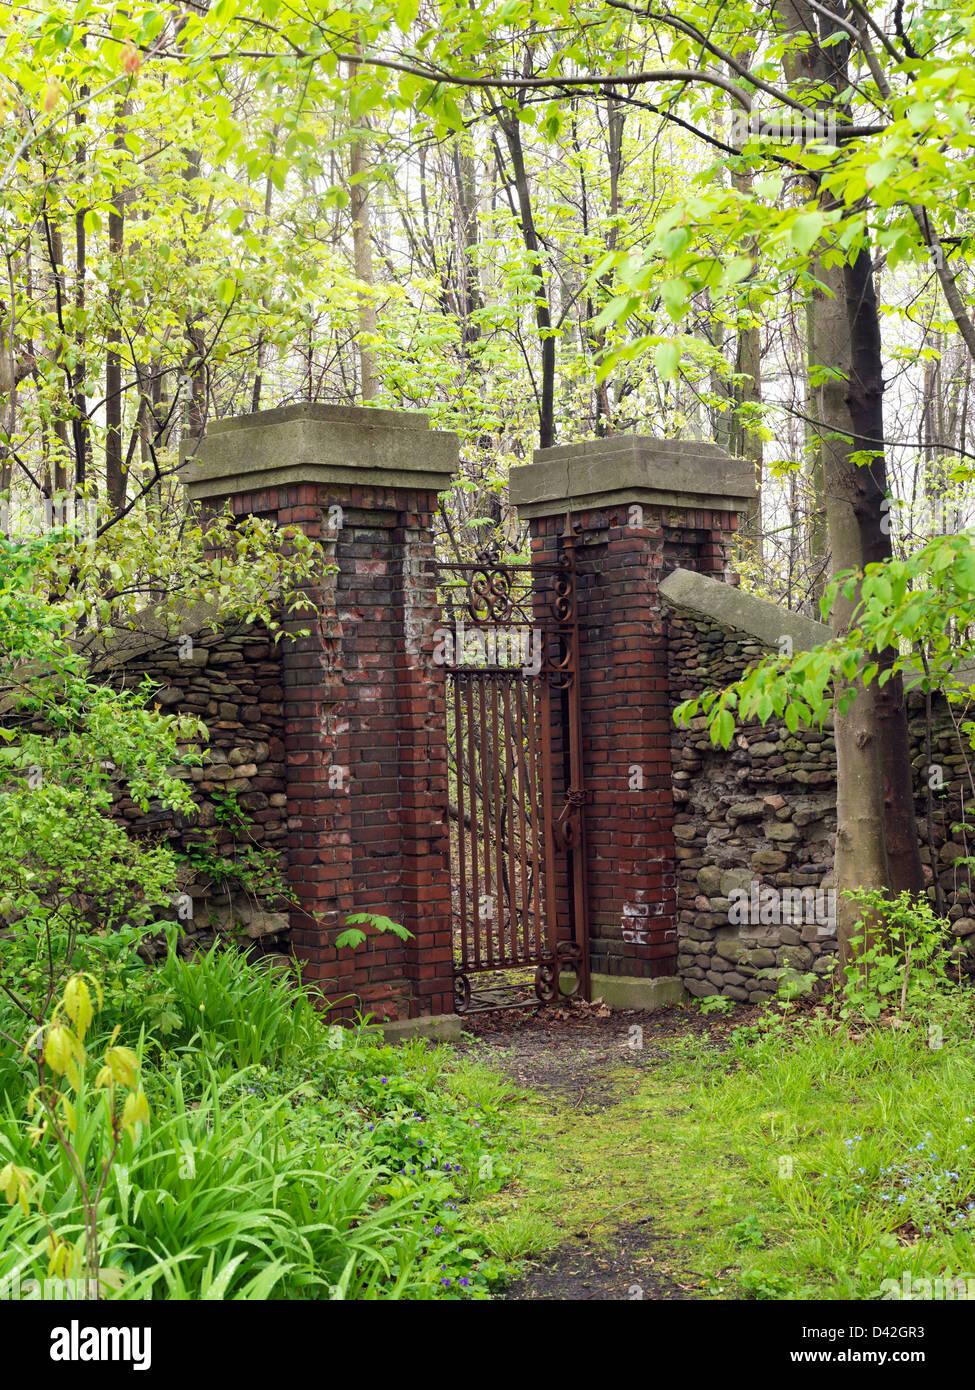 Canada,Ontario,Niagara-on-the-Lake, gate to an estate - Stock Image